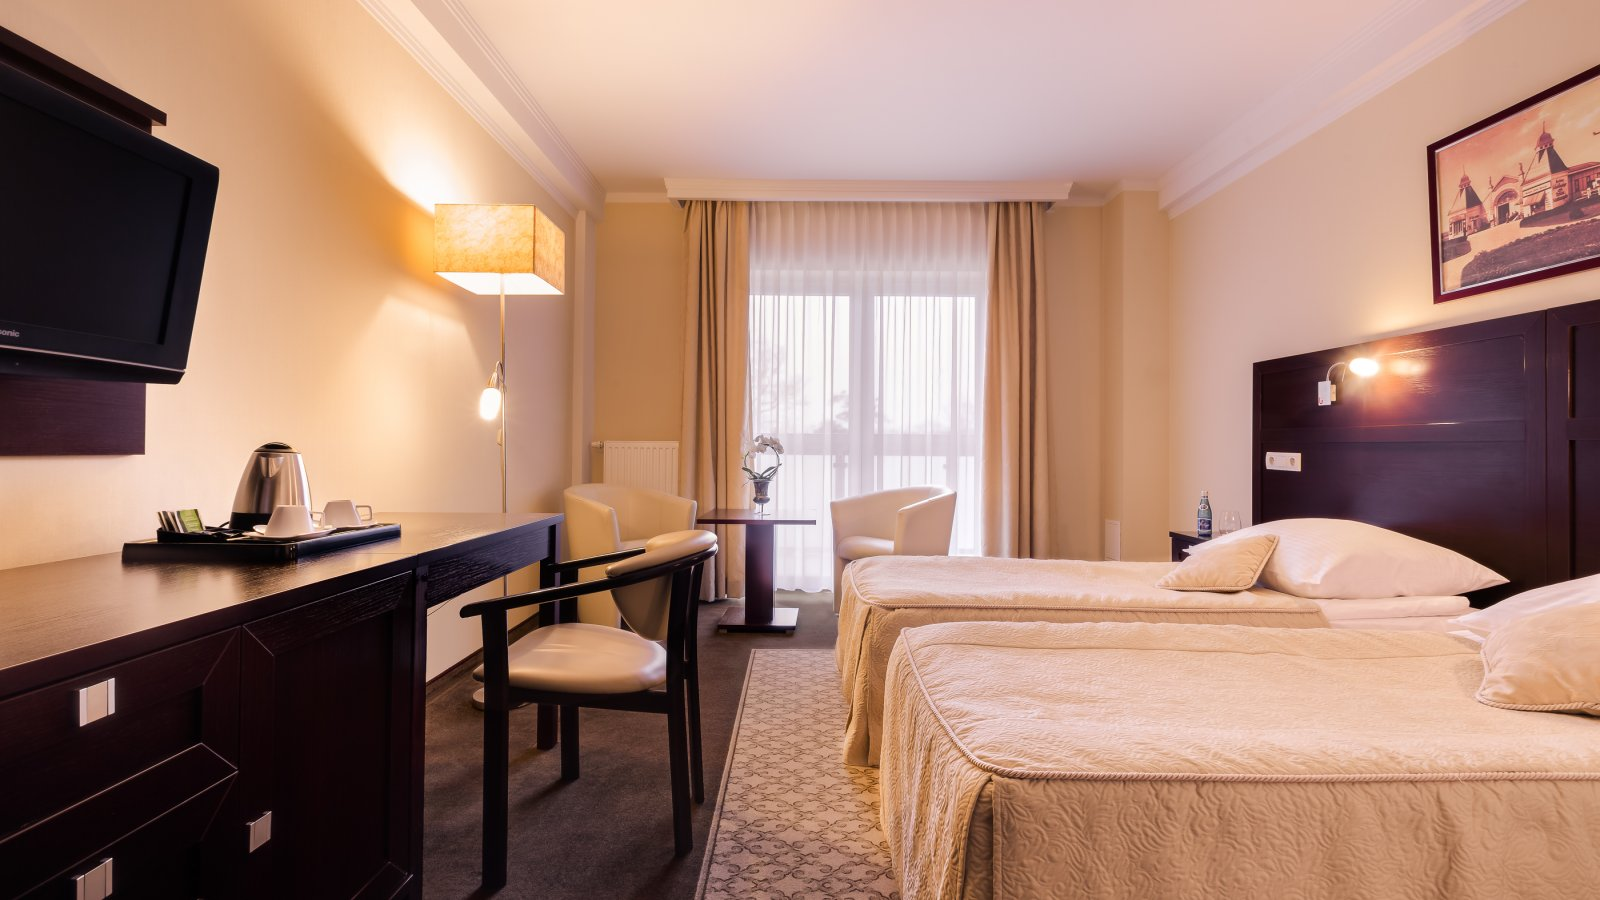 Hotell Aurora room-4